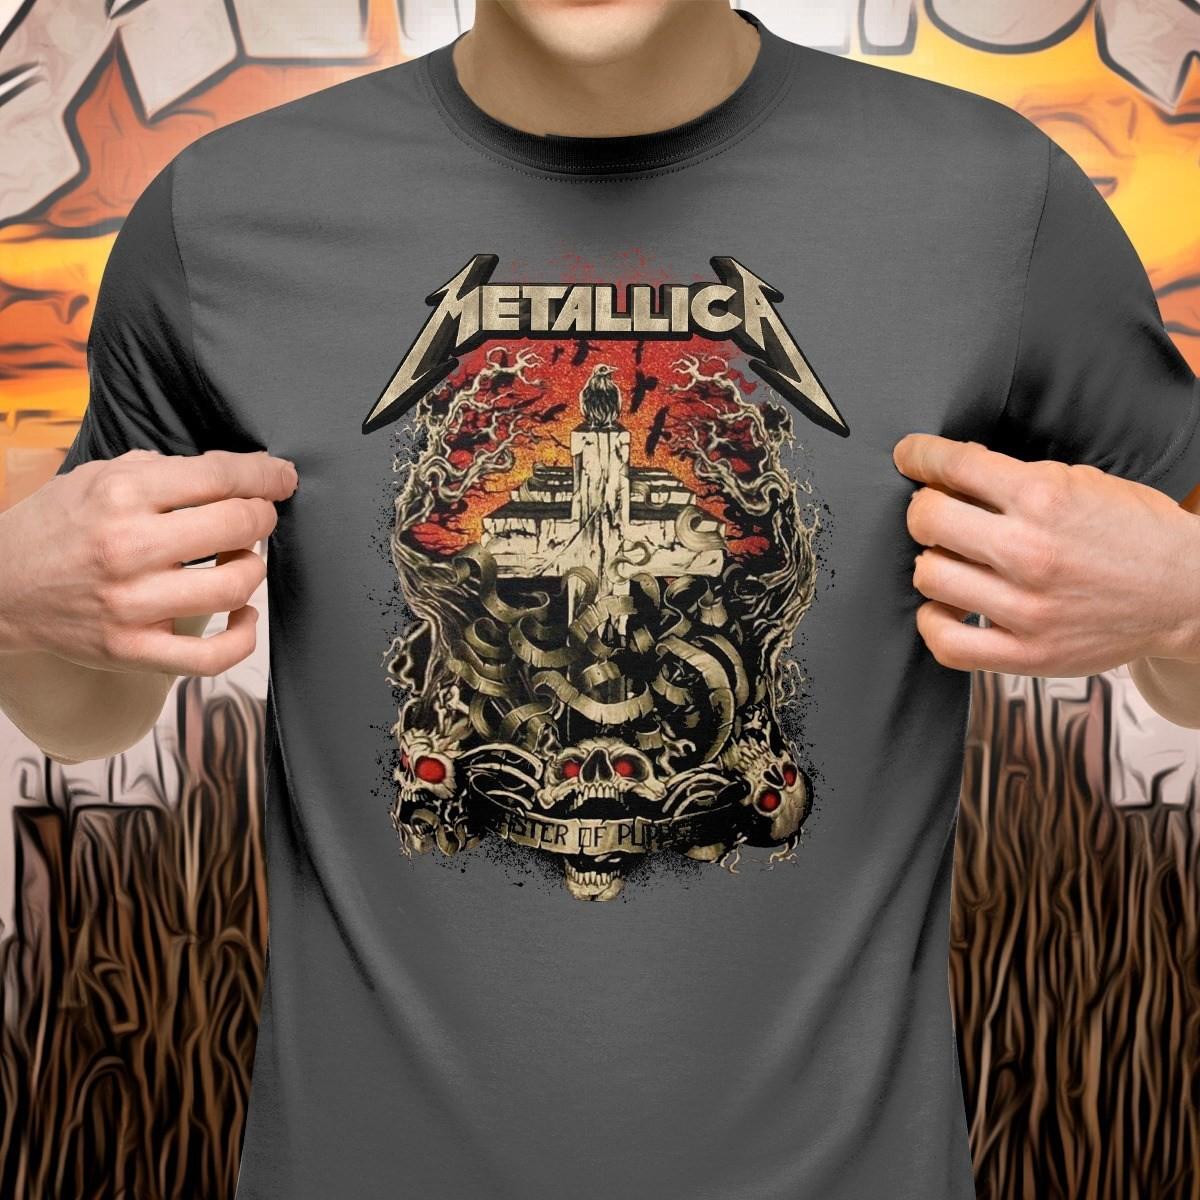 Camiseta Master Of Puppets: Metallica (Cinza)